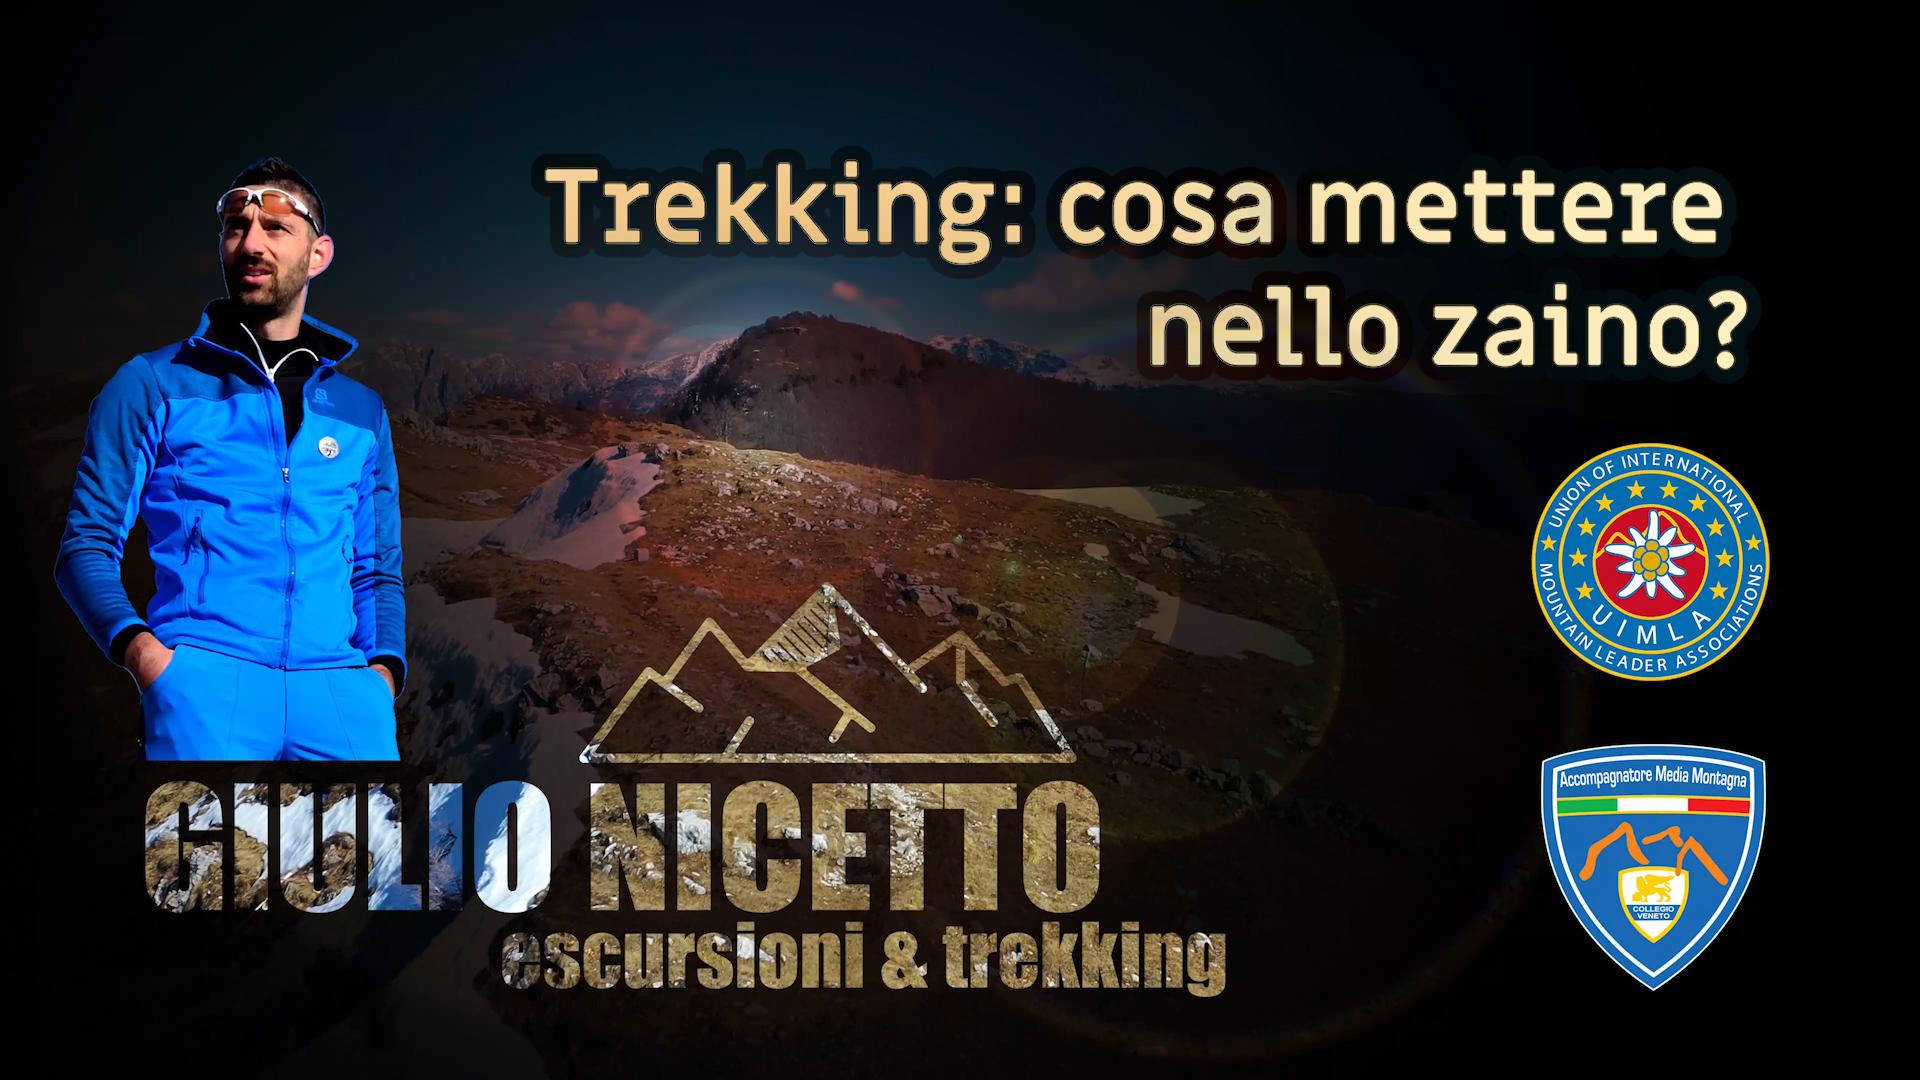 Trekking: cosa mettere nello zaino?